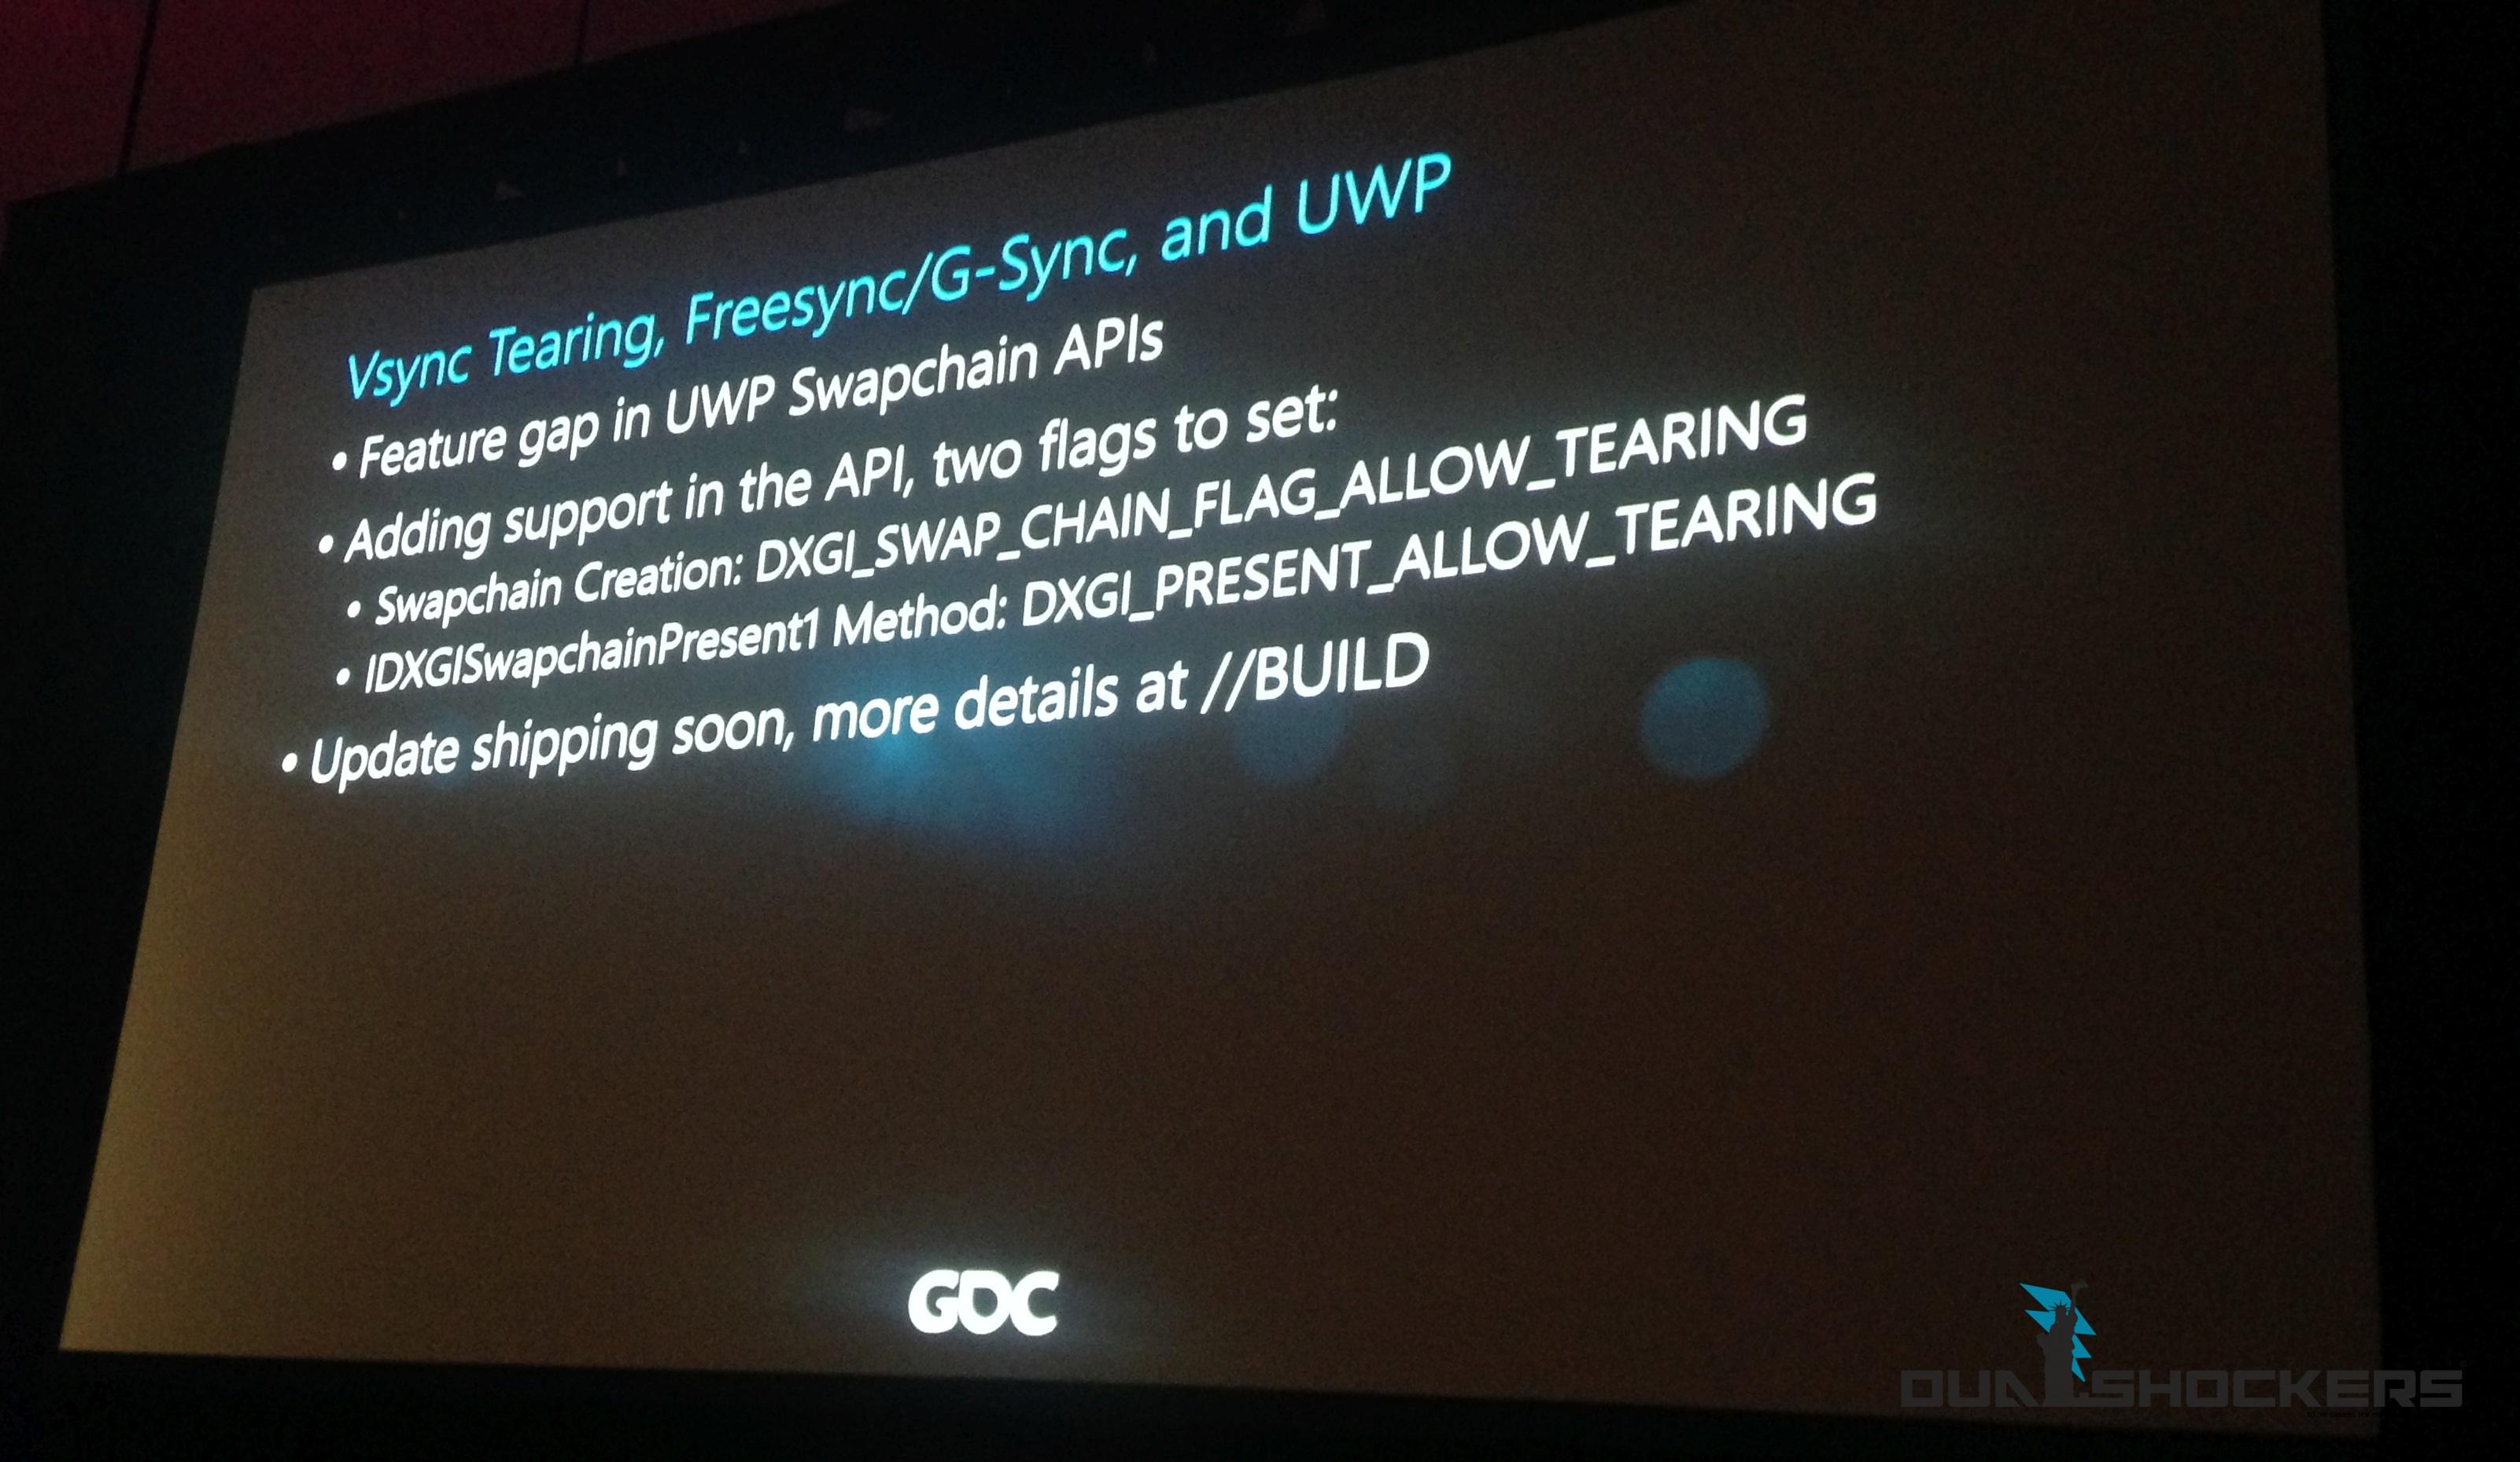 Microsoft-uwp-vsync-tearing-gsync-freesync